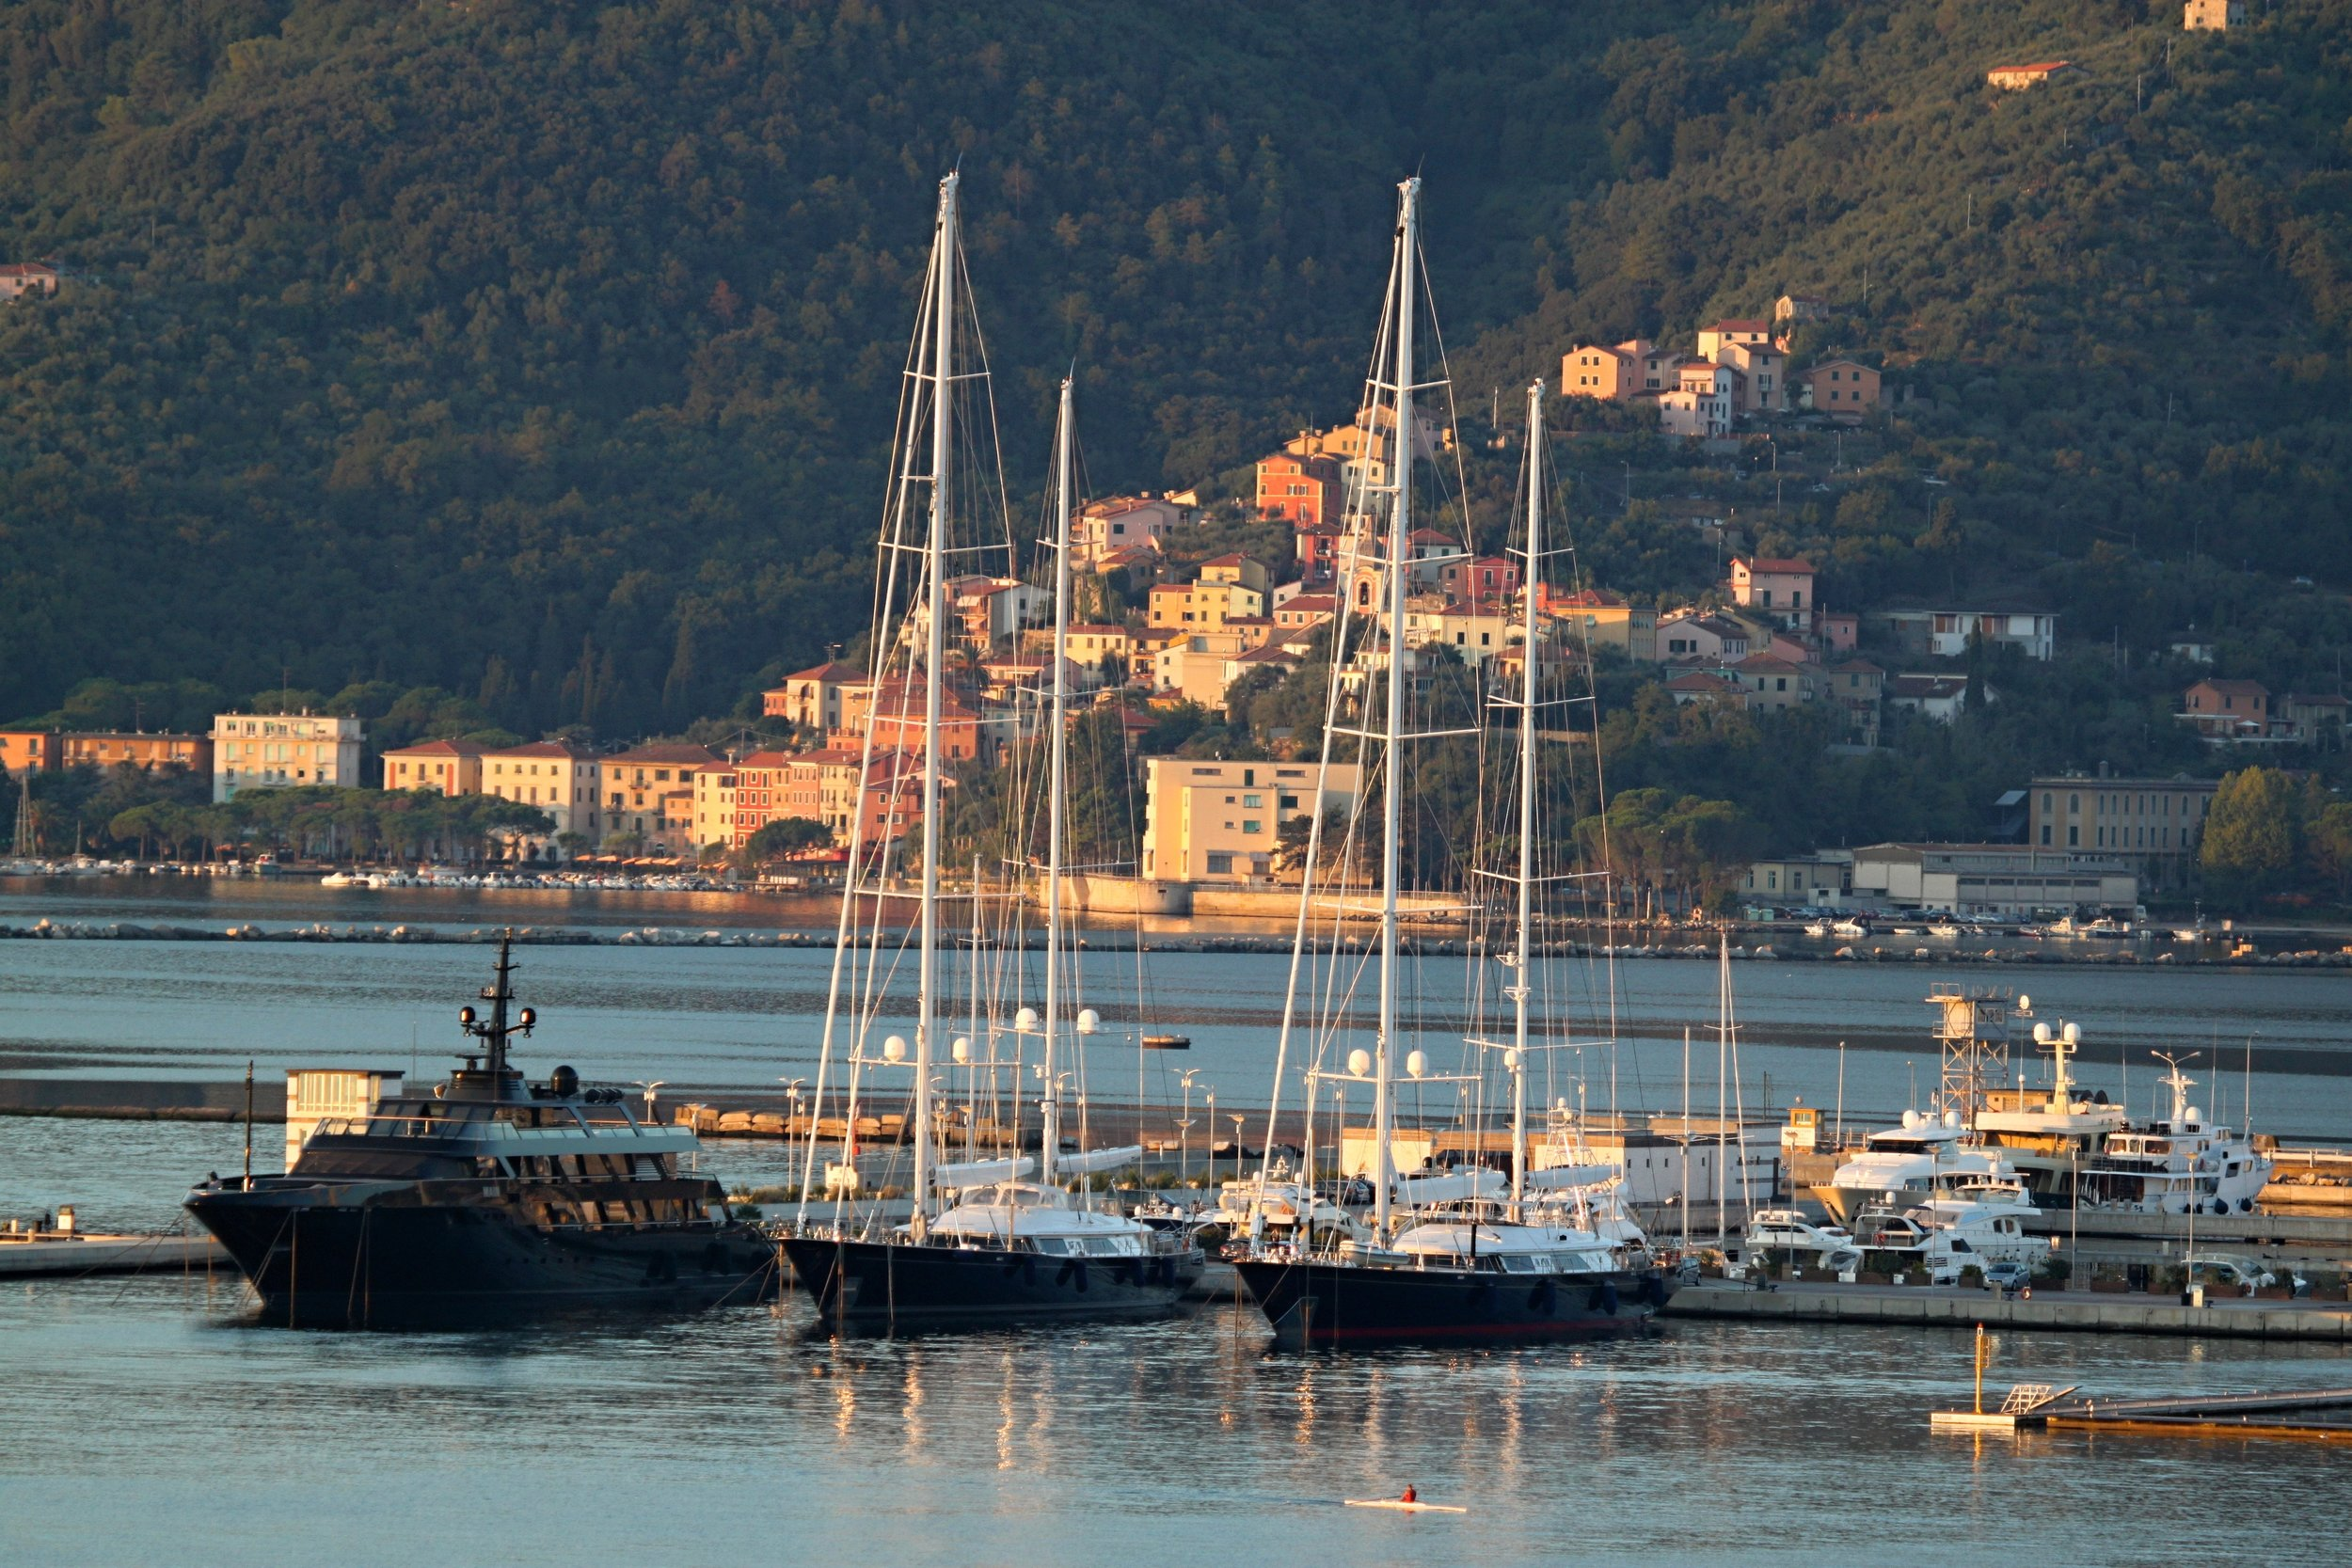 La Spezia Port